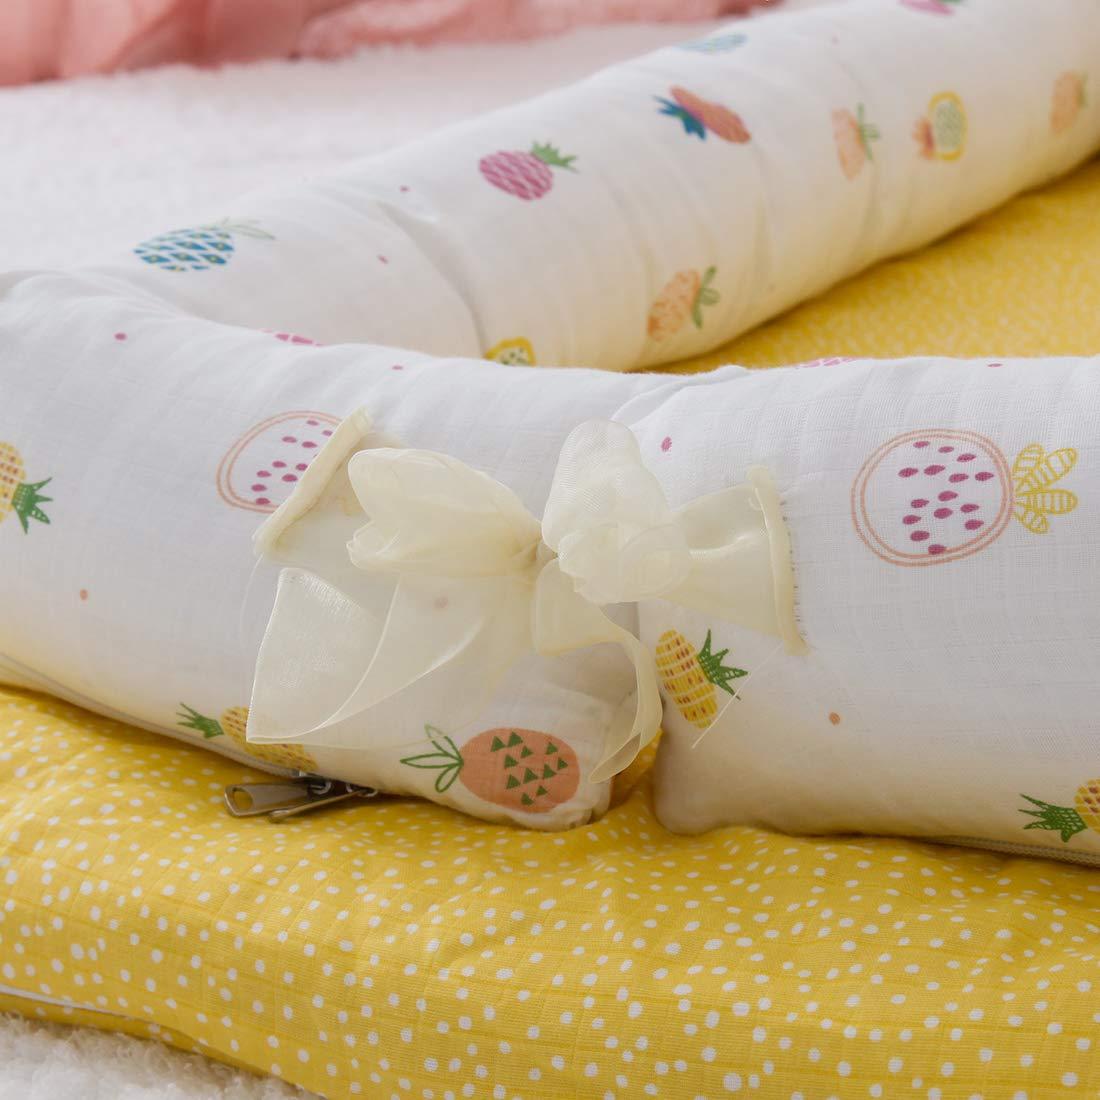 DorkasDE Babynest Kuschelnest Matratze im Bett Faltbett tragbar Babybett Reisebett mit Gaze Au/ßenmaterial